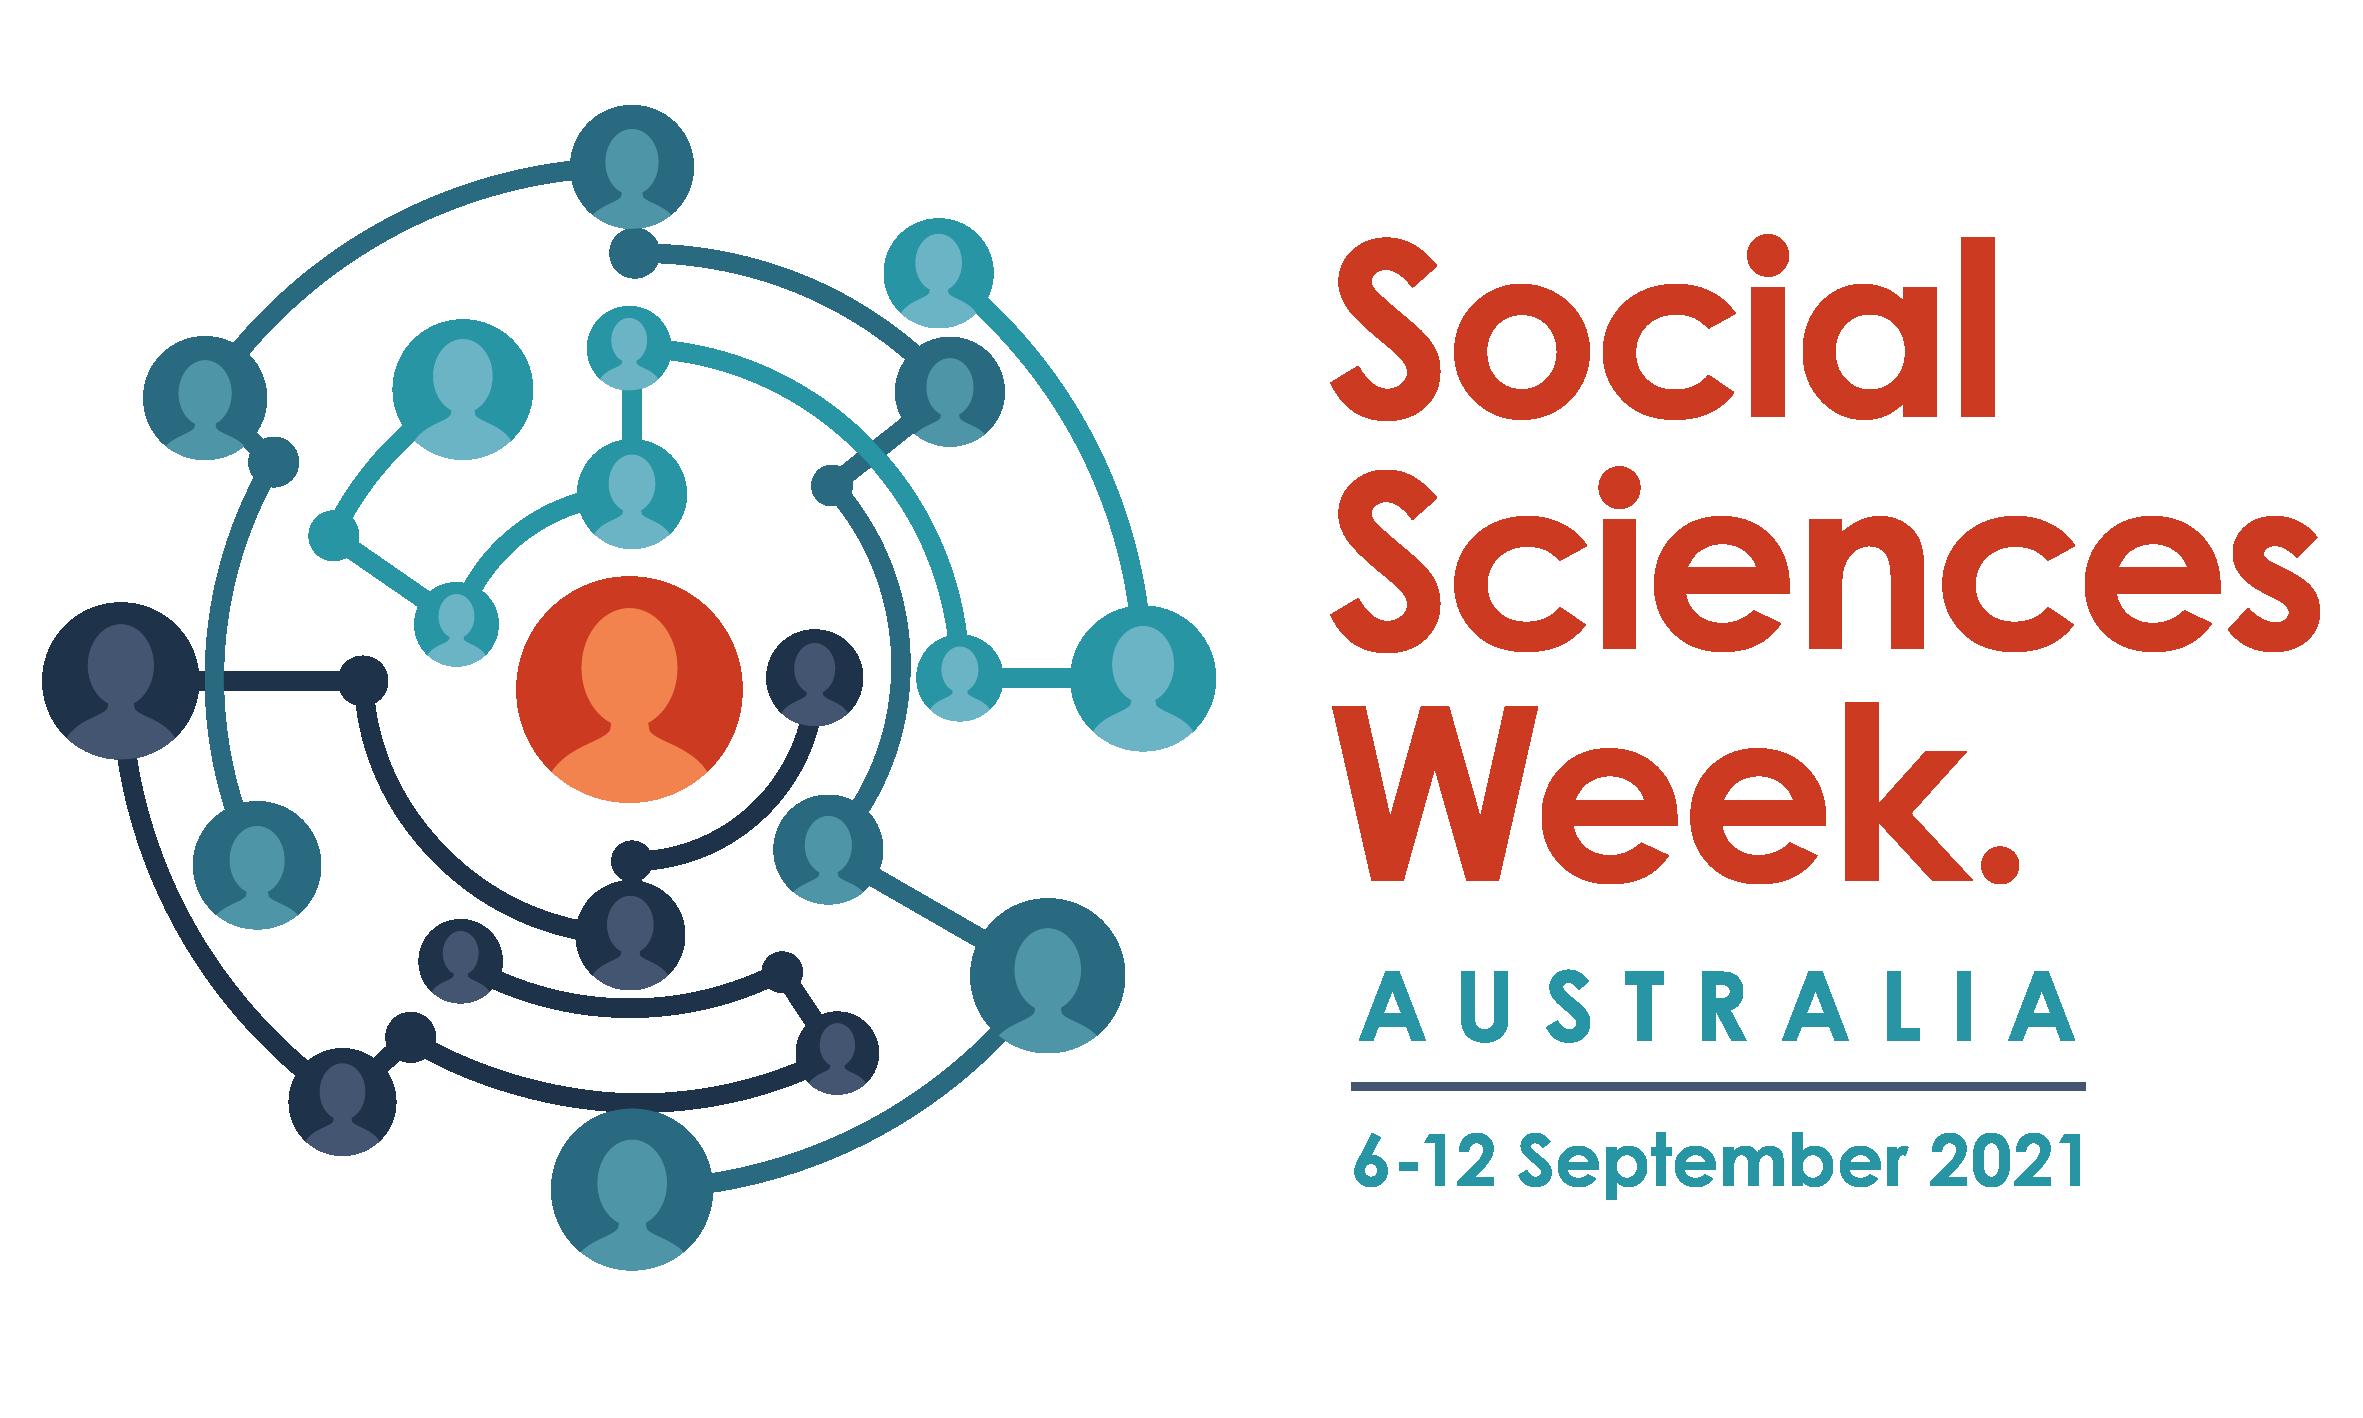 Social Sciences Week 2021 small logo